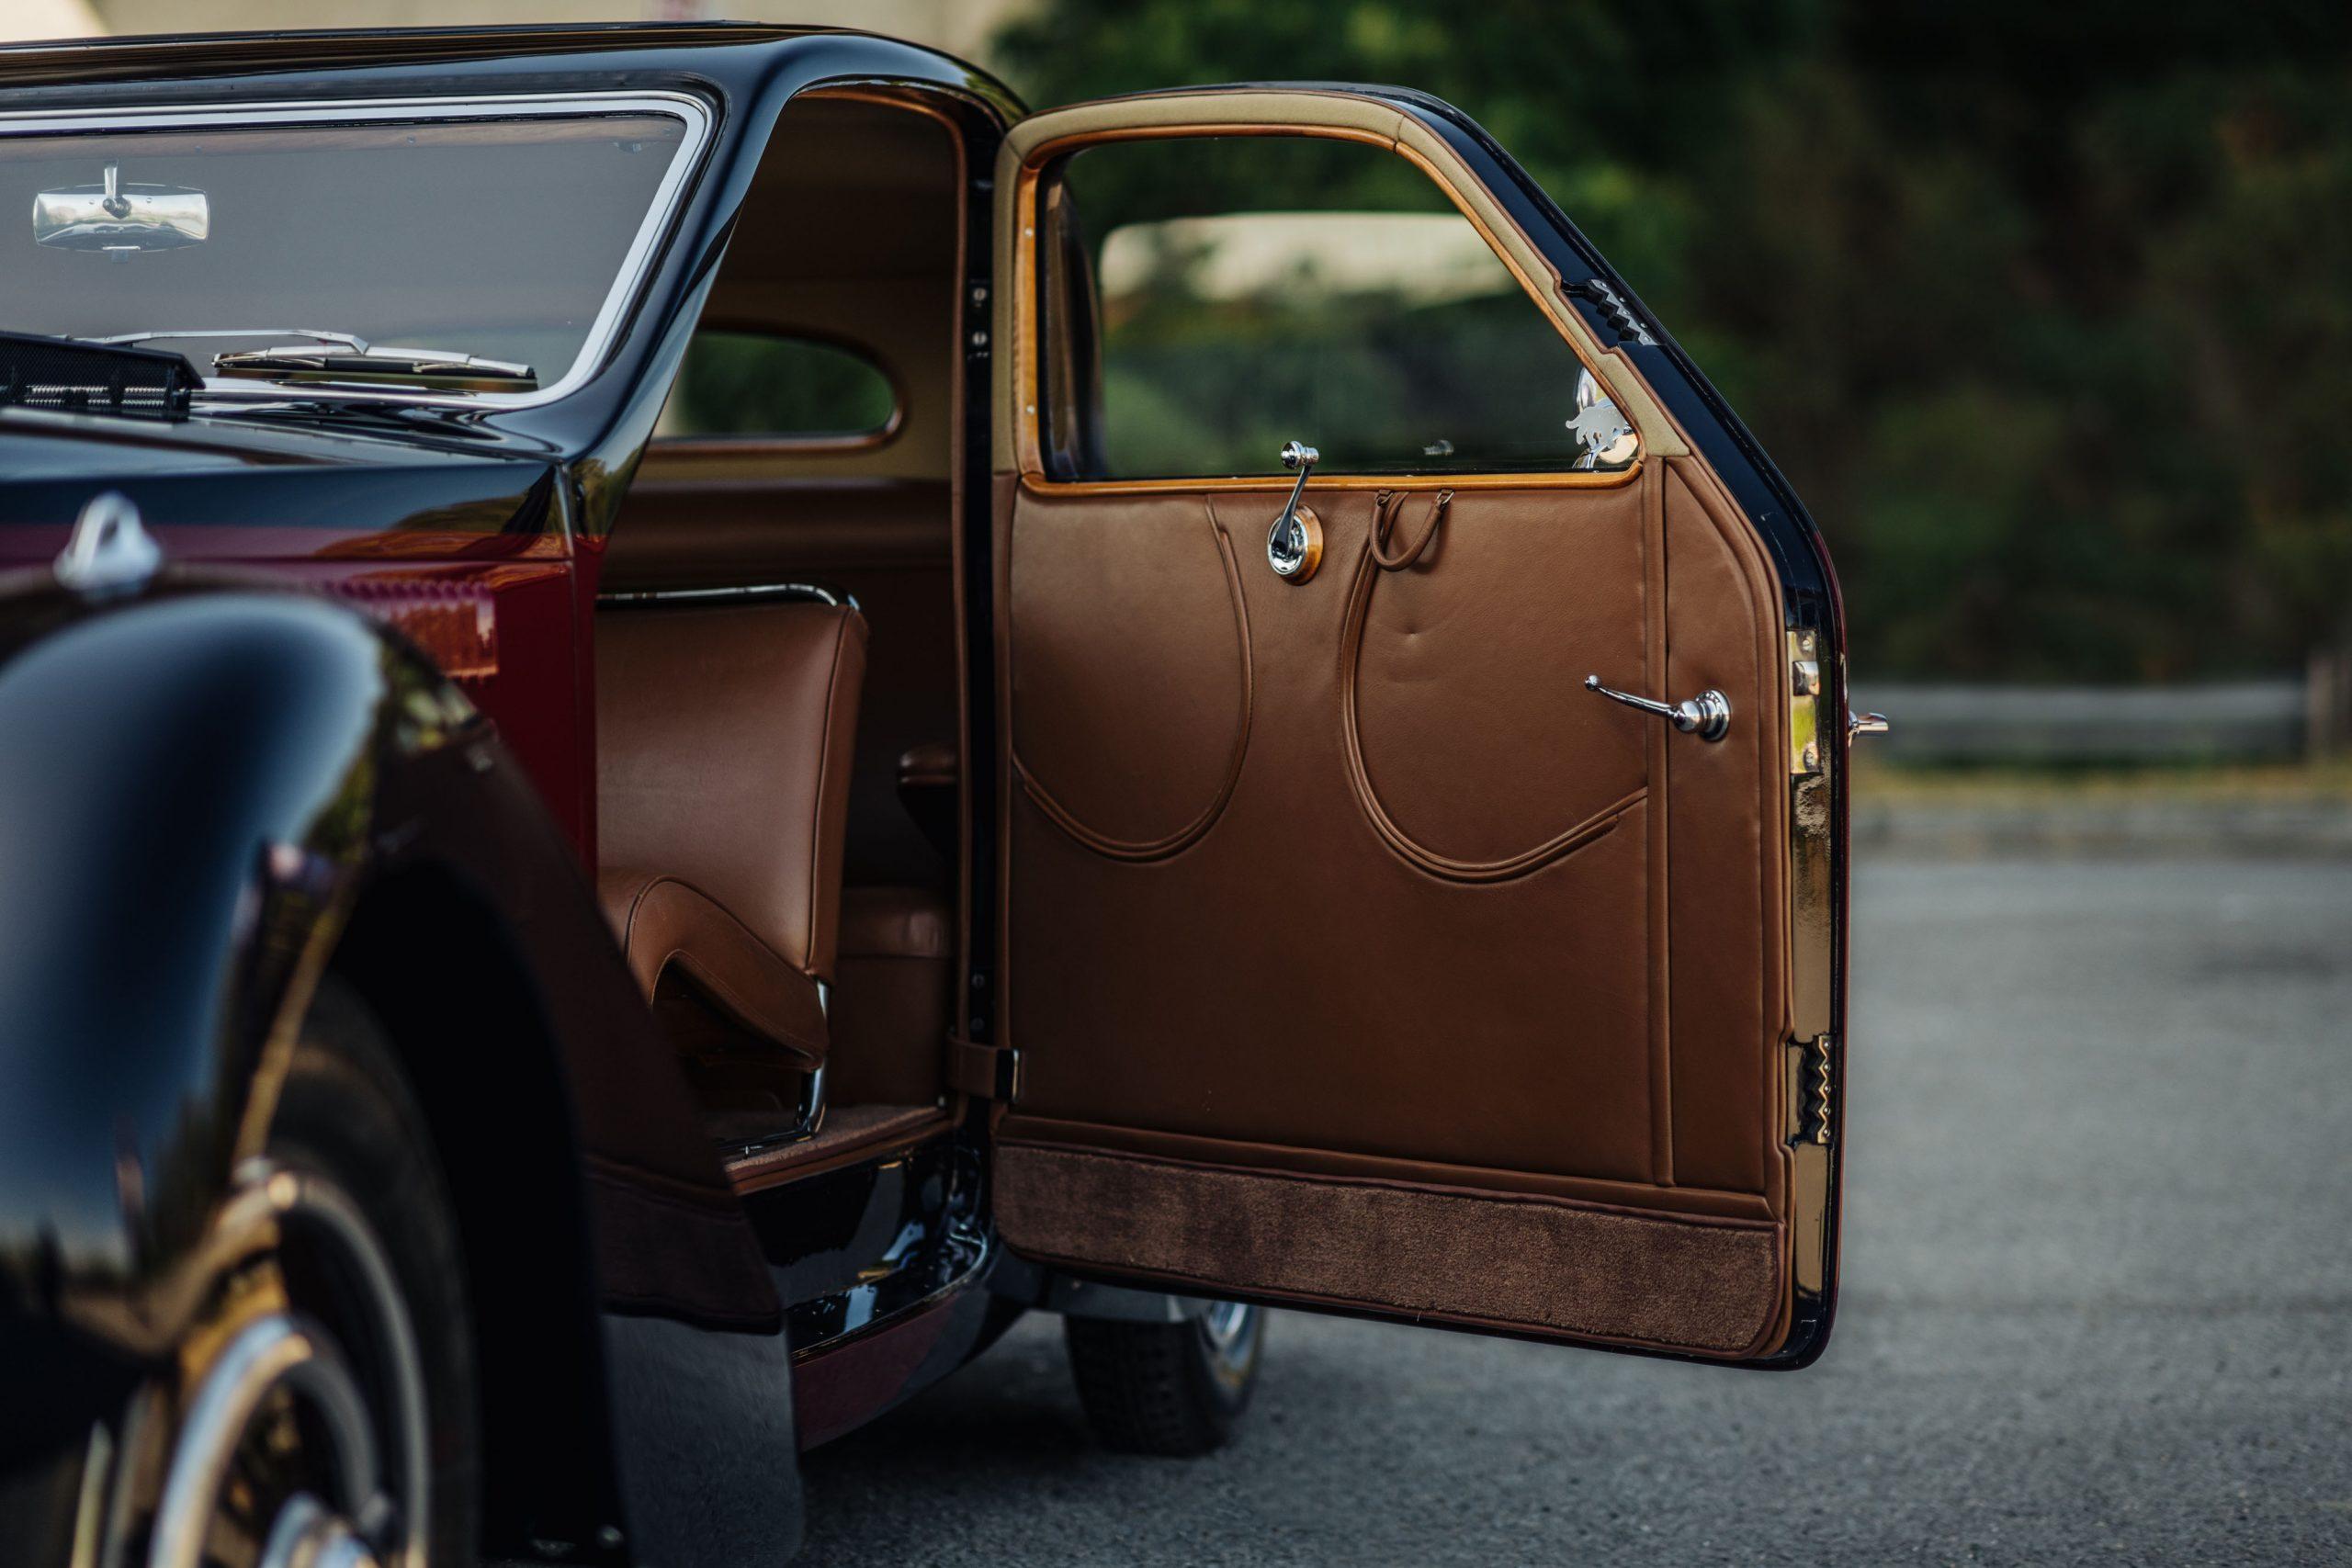 Bugatti 57C Ventoux open door leather